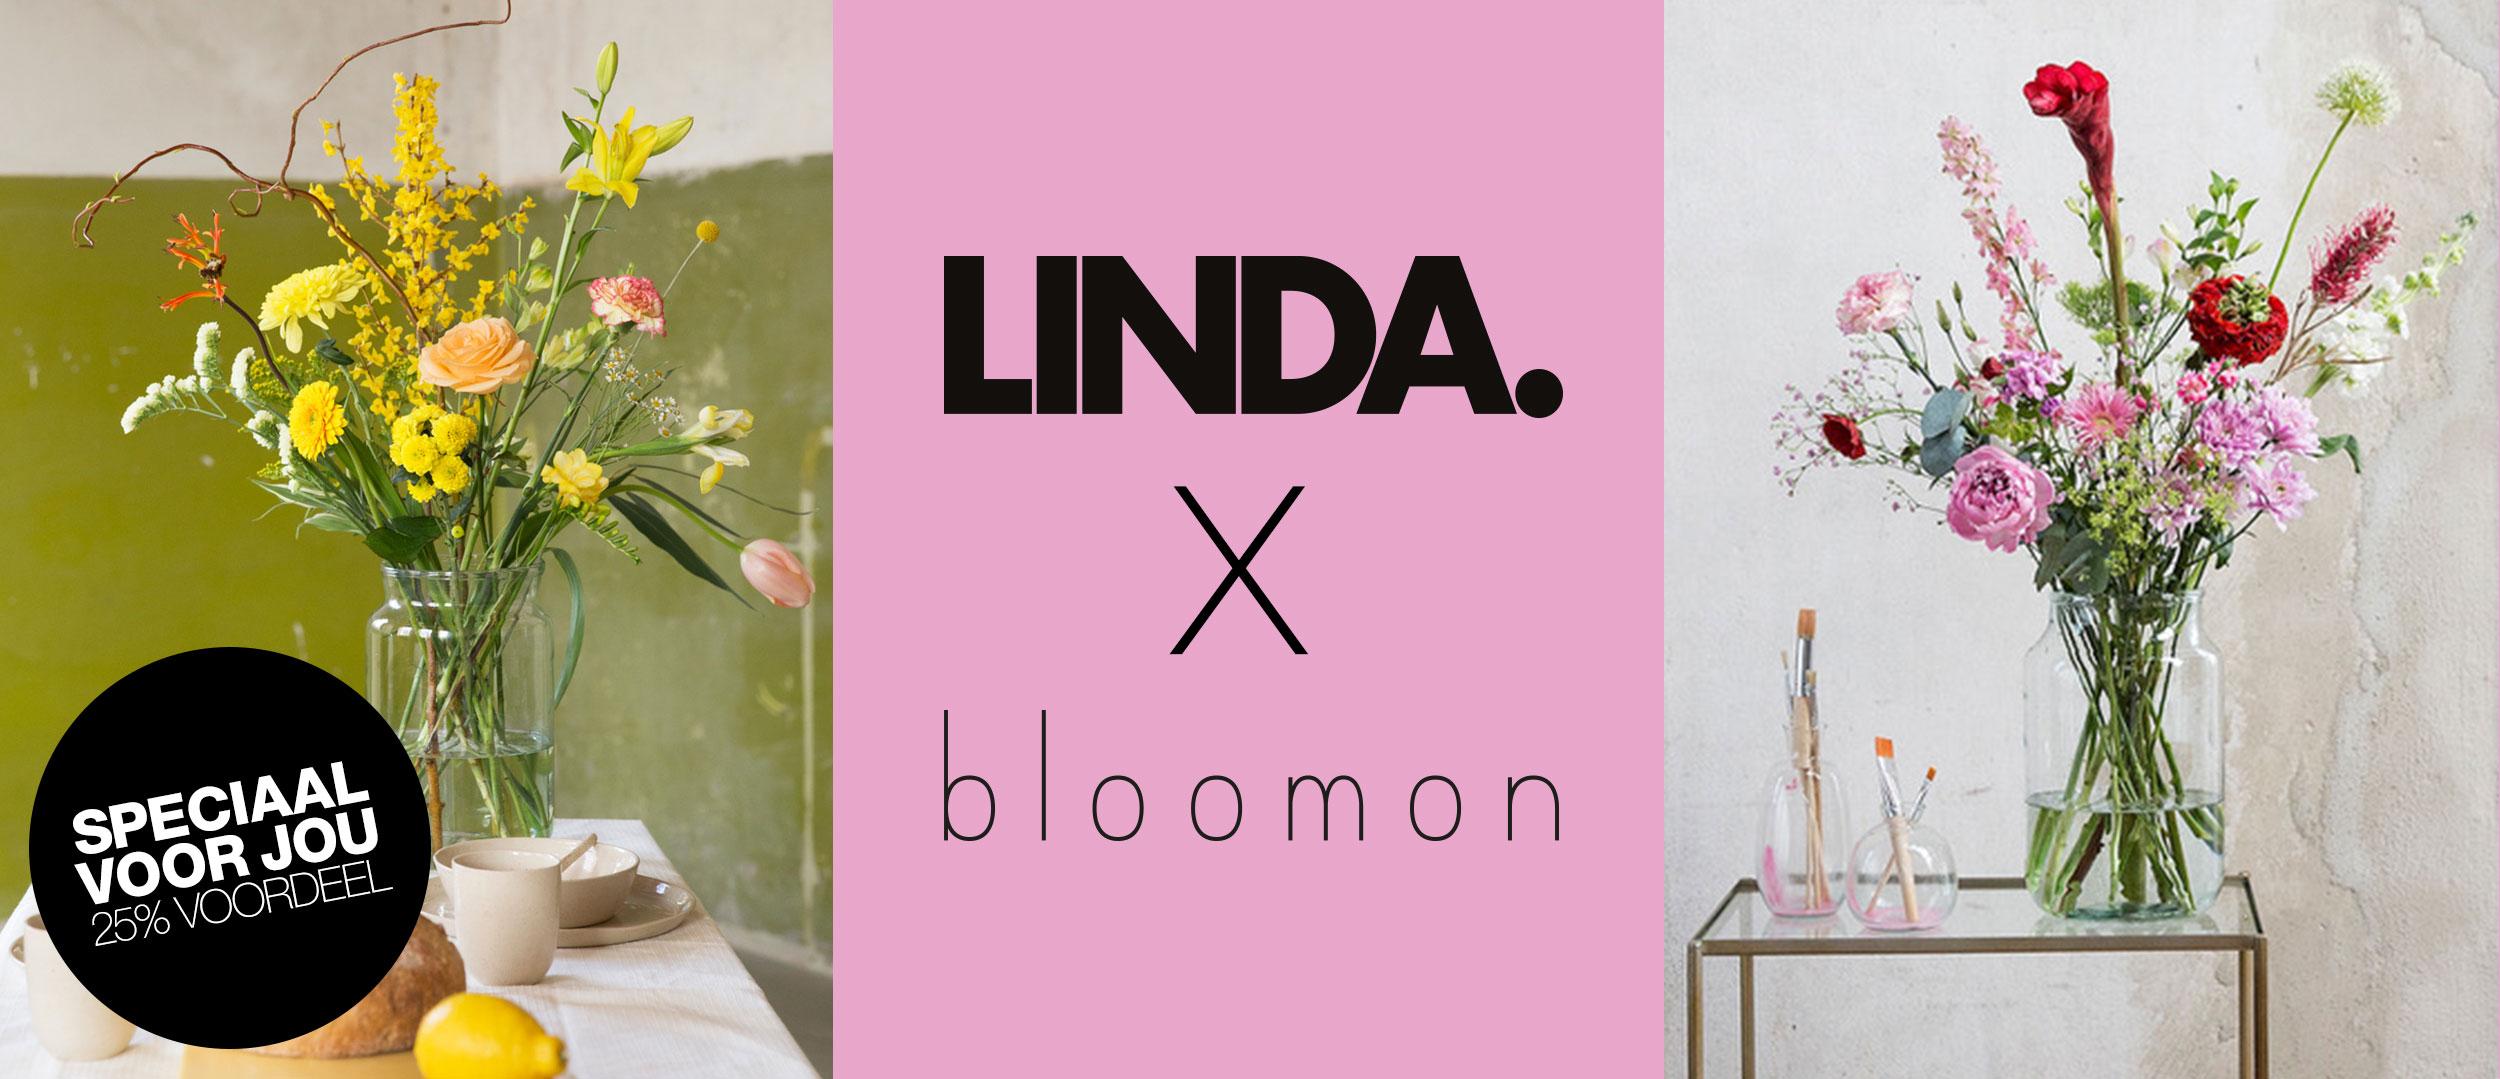 25% korting @ BLOOMON via LINDA